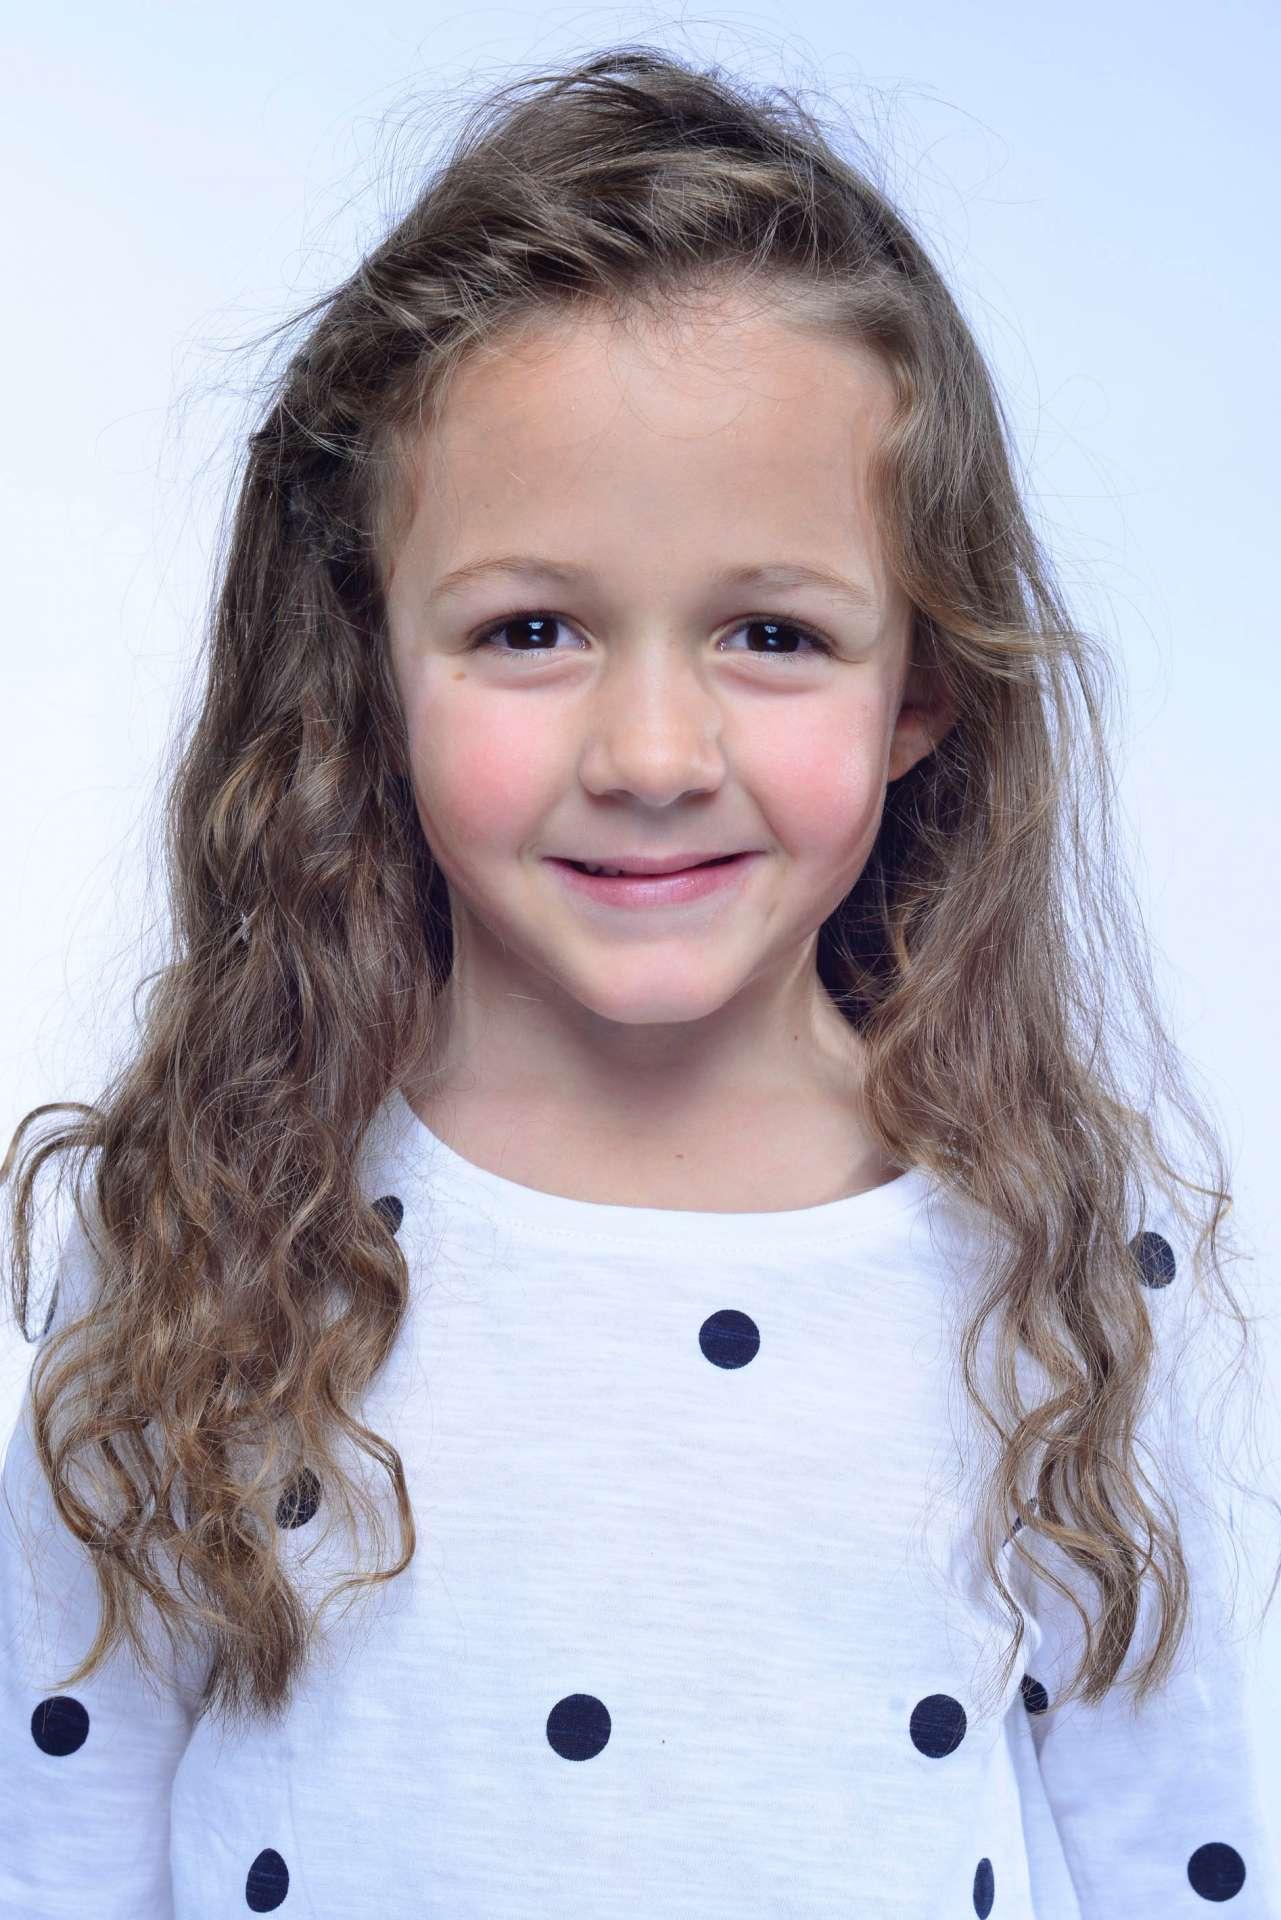 Sophie Mattheopoulos